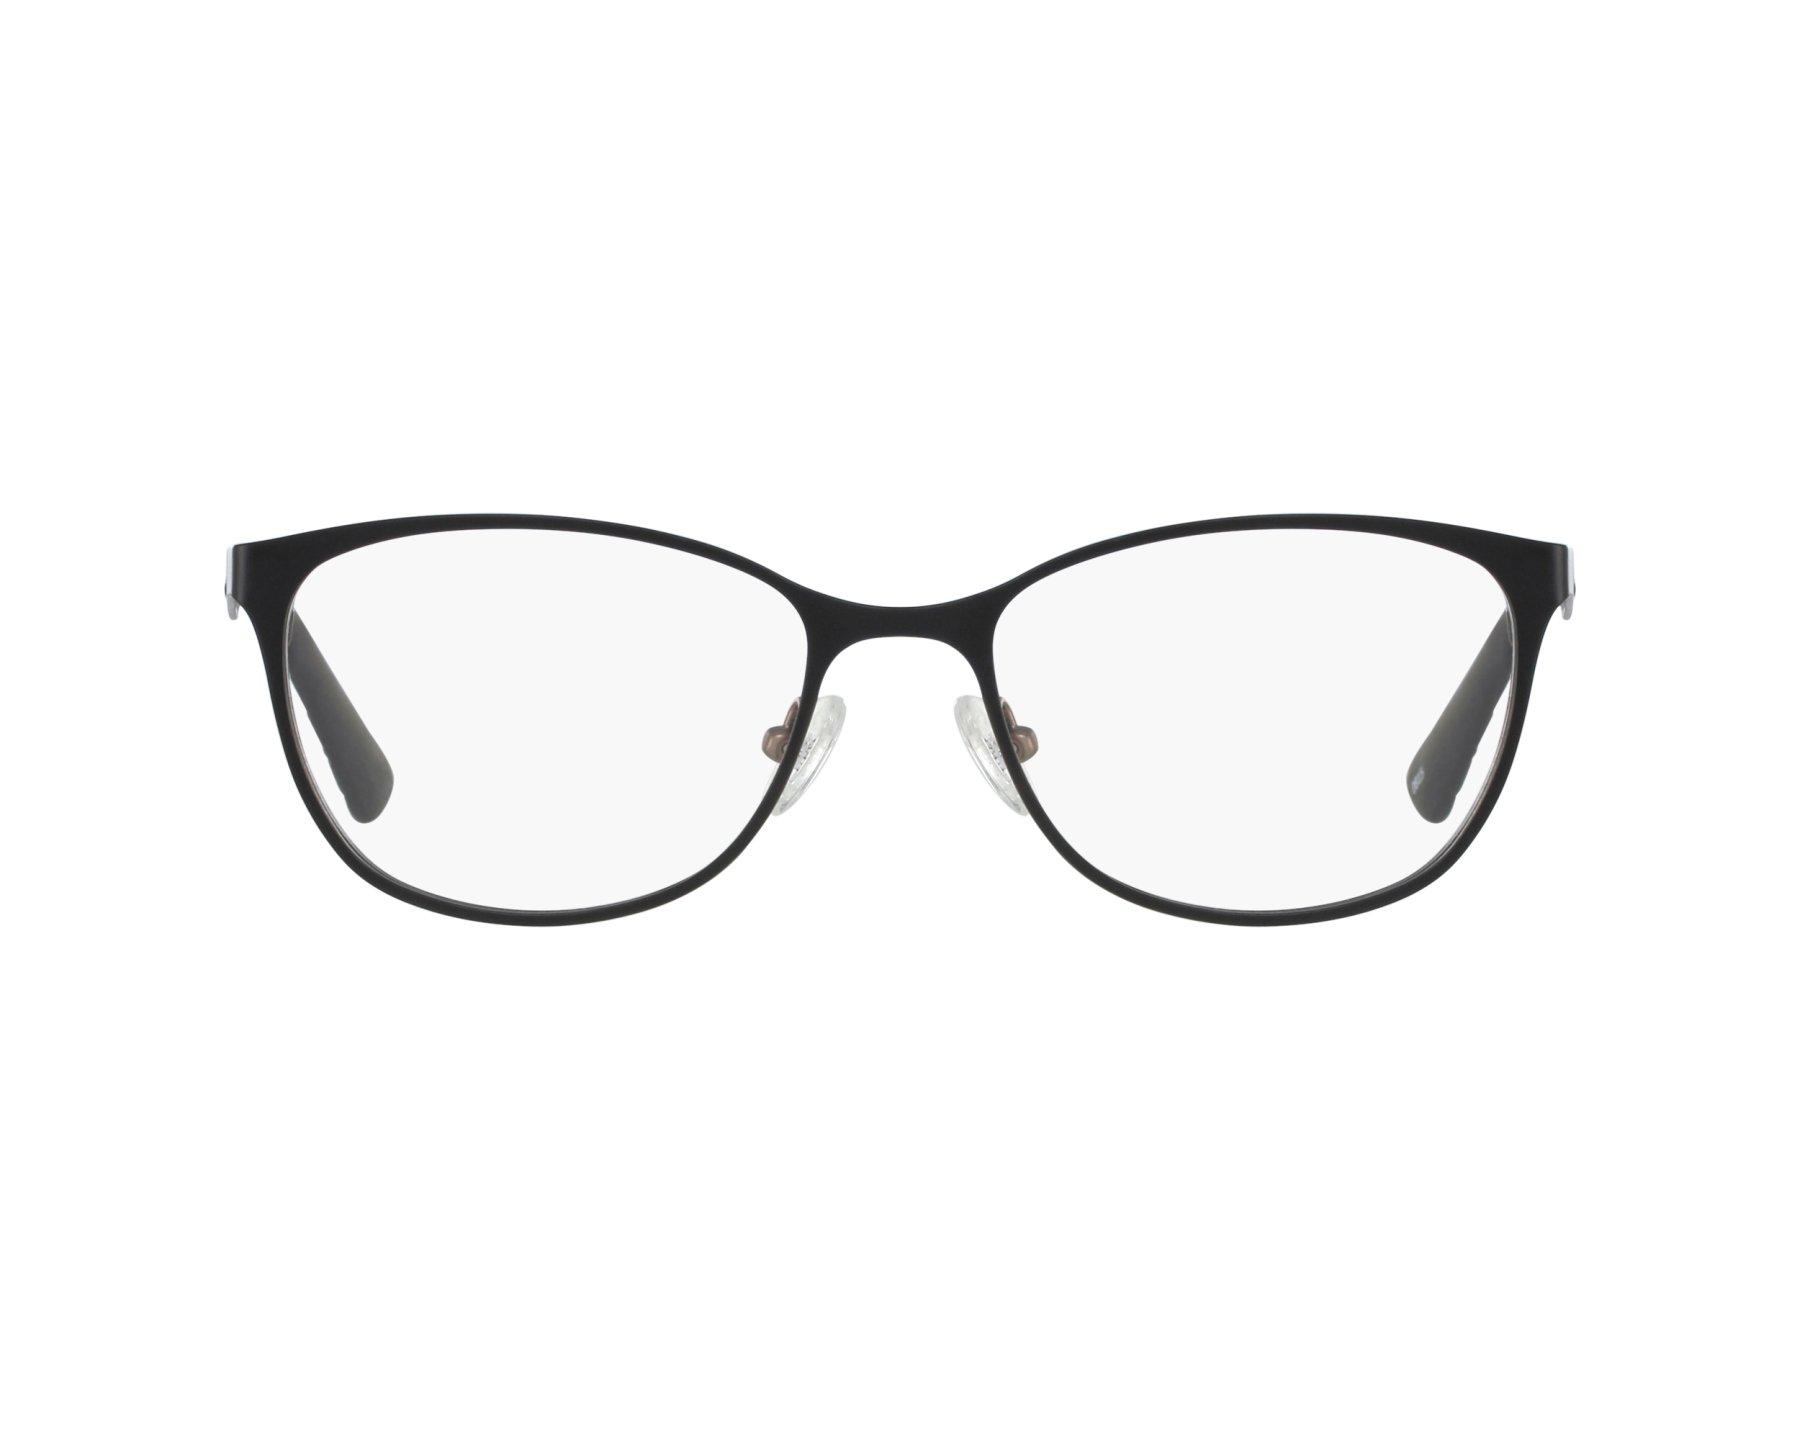 Guess Eyeglasses GU-2564 002 Black   visio-net.co.uk